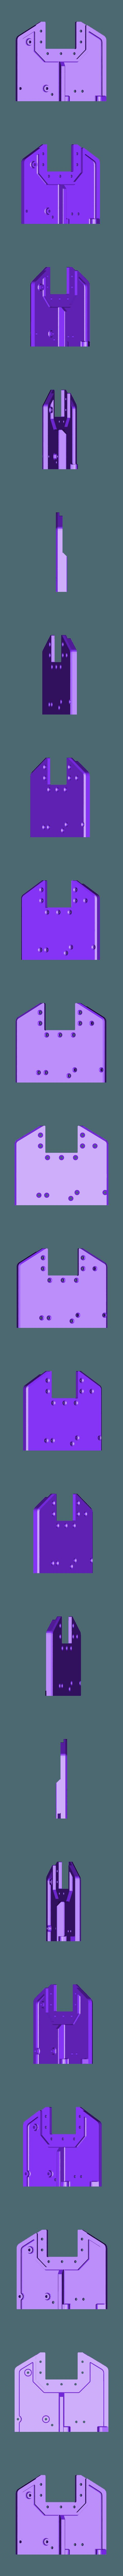 Rear Frame___.STL Download free STL file 1/10 RC 4WD TRUGGY BT250.2 • 3D printer object, ivnssnn